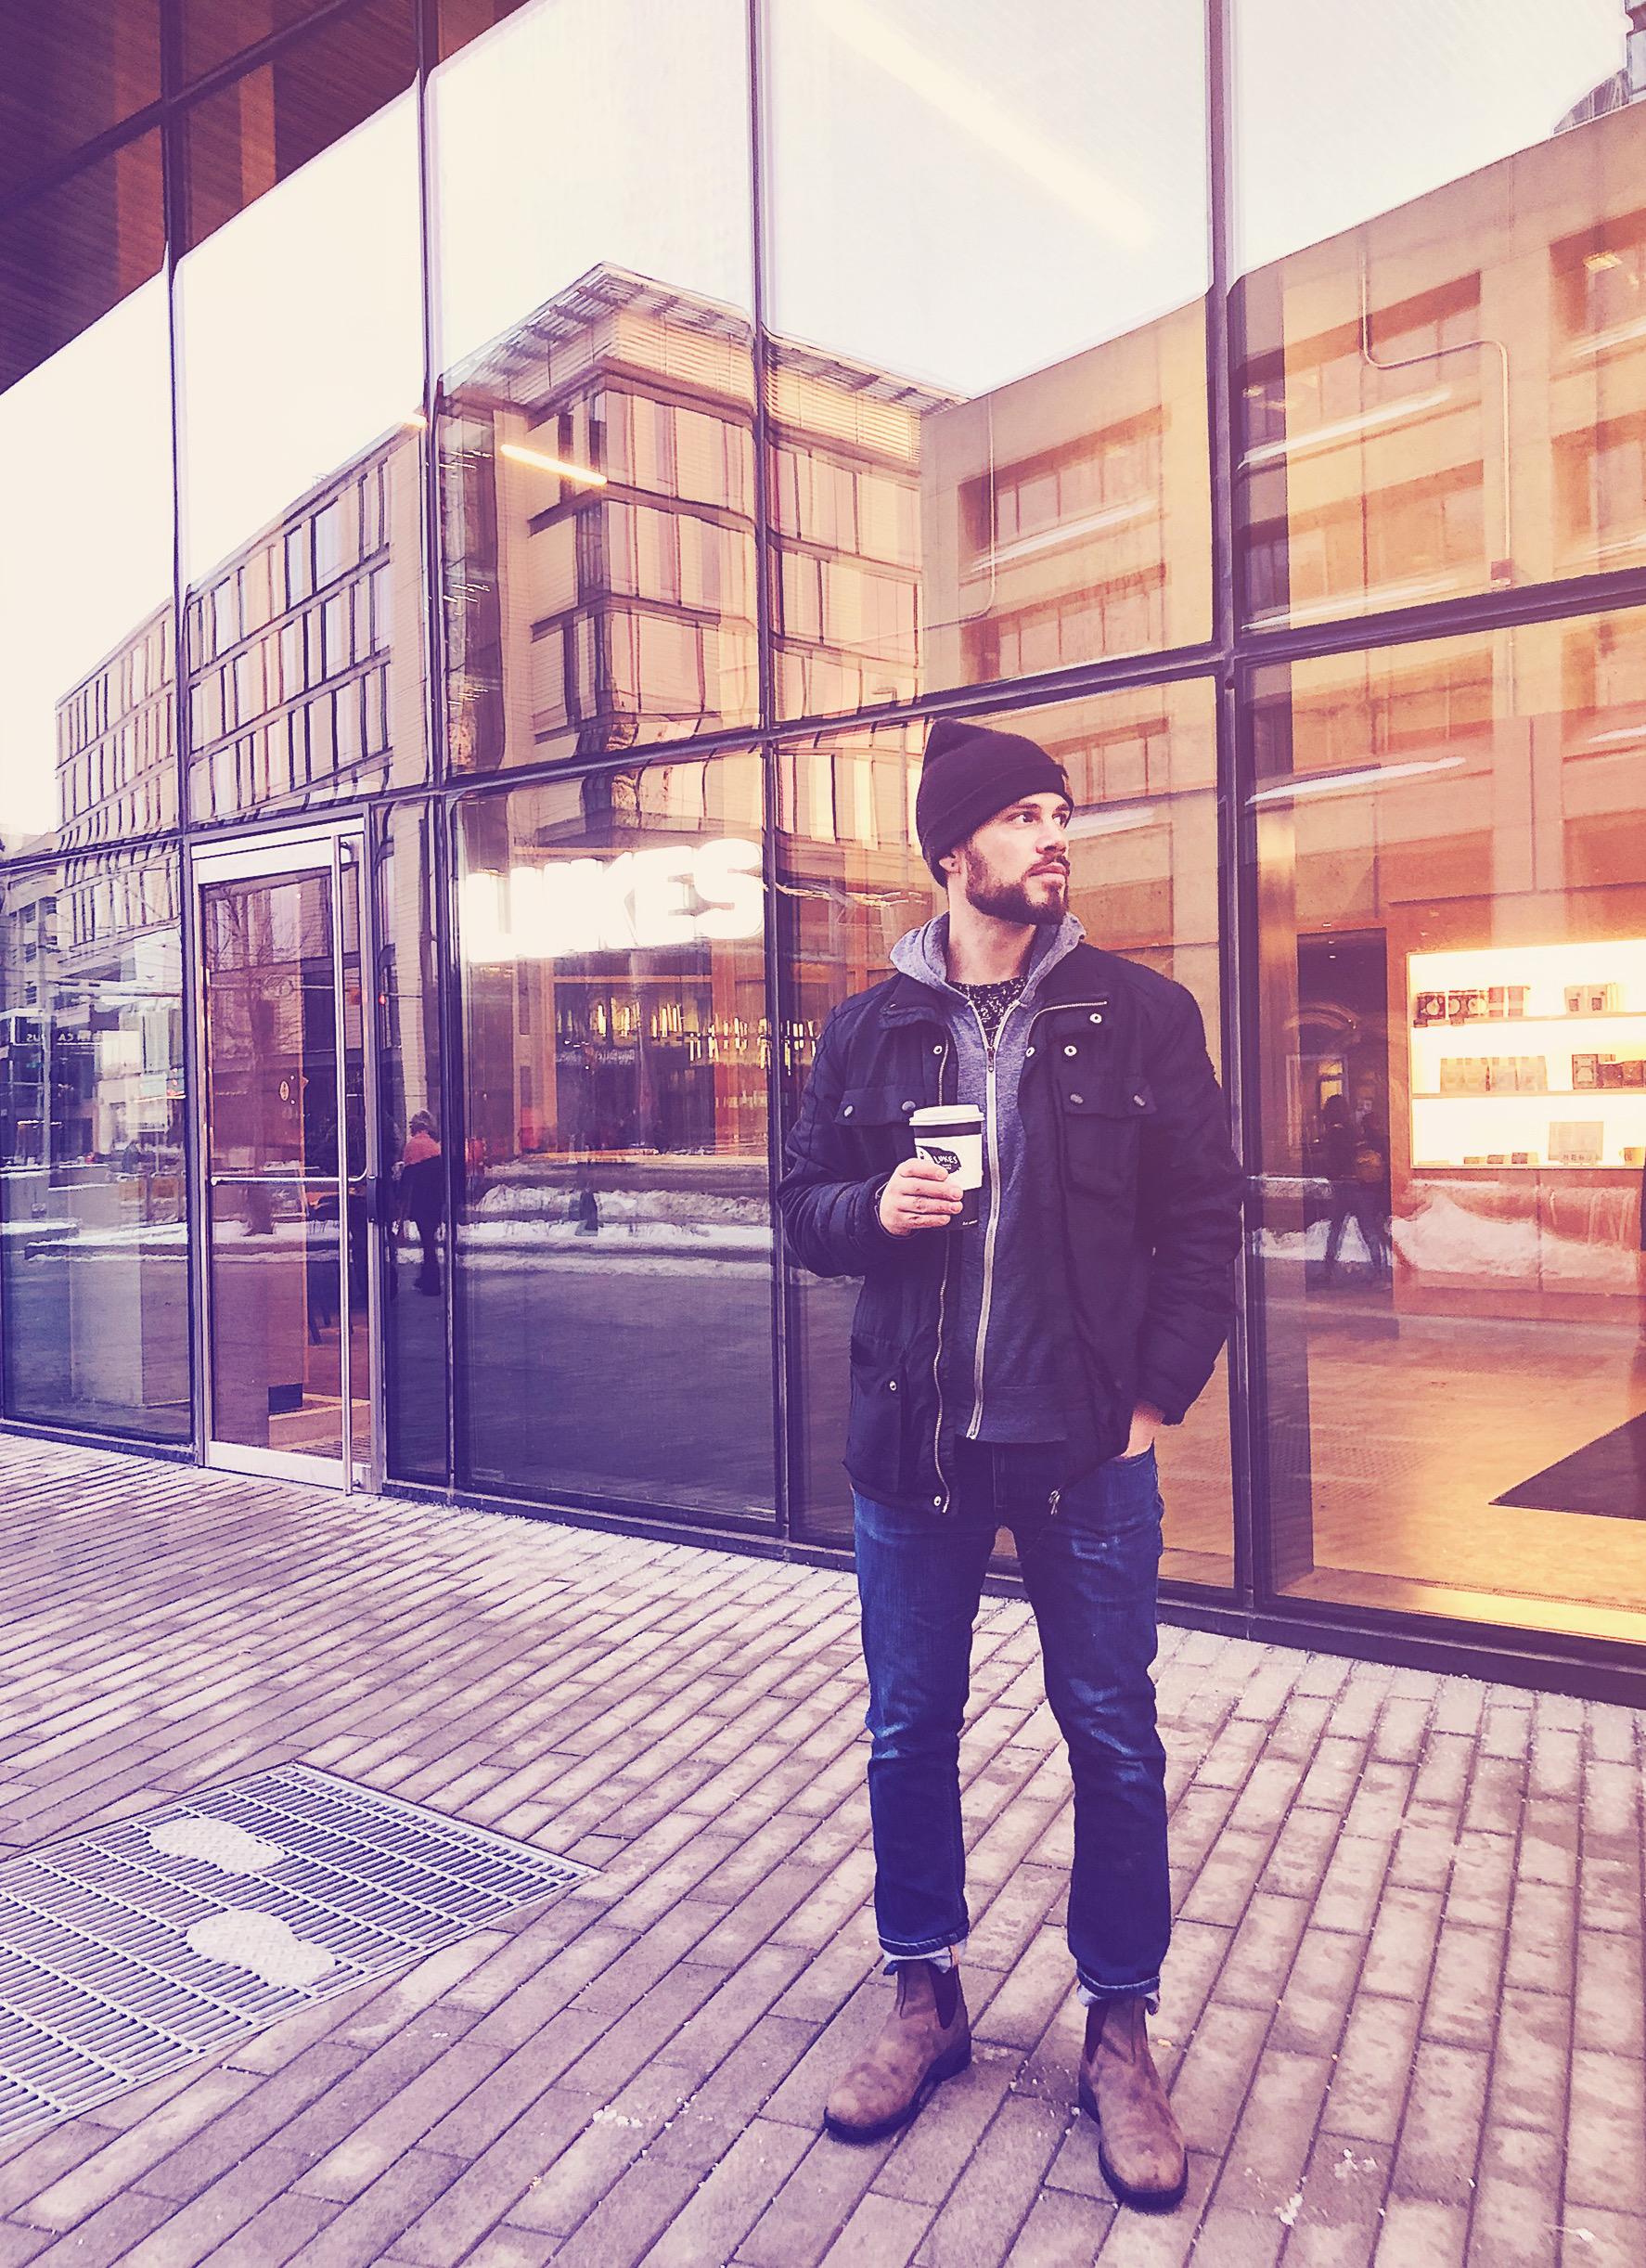 DAVID DEAN - Photographer@david_deandaviddeanphoto.com